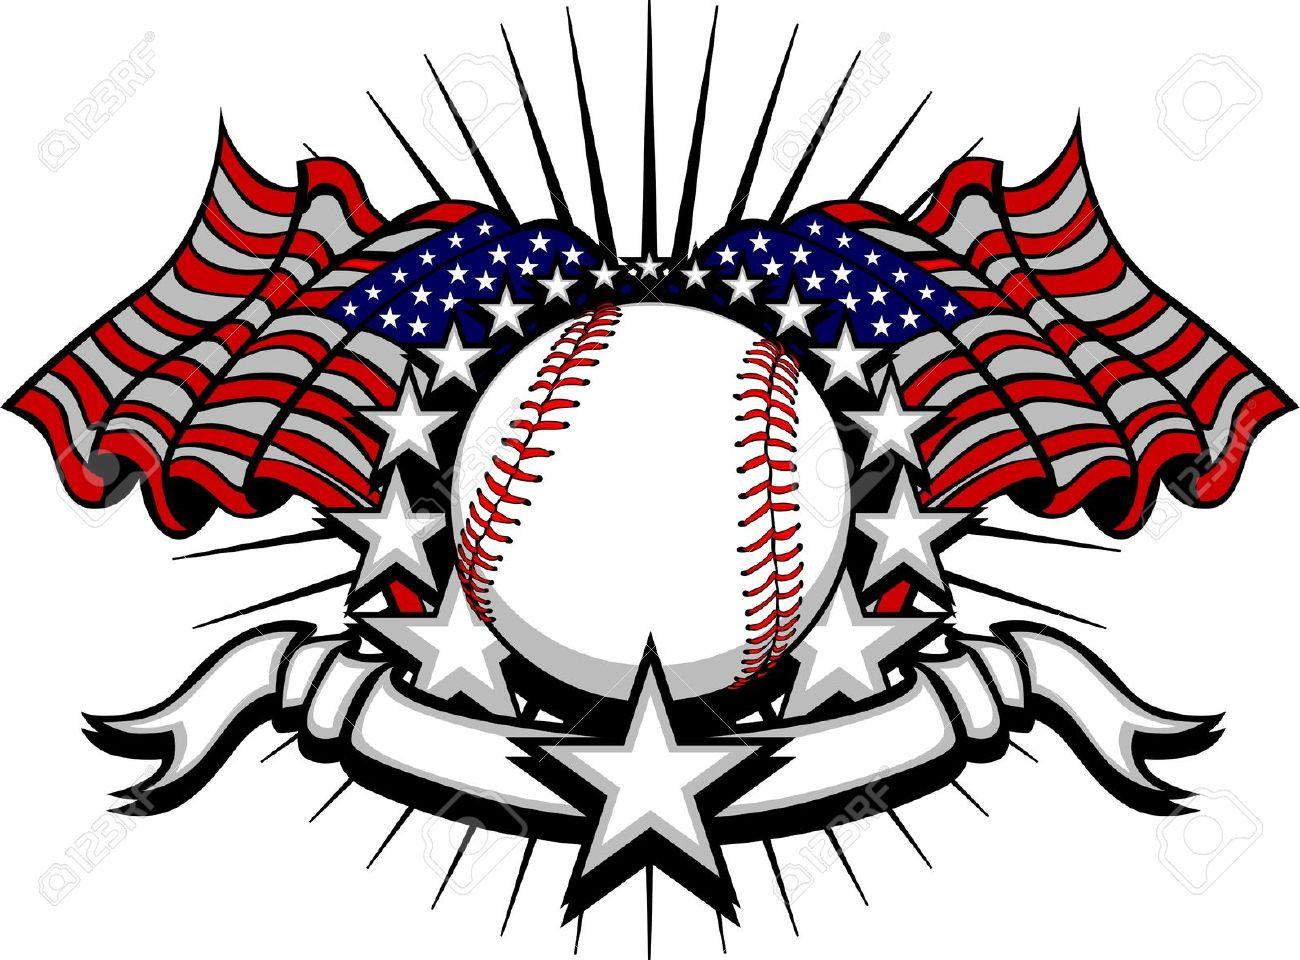 Clipart of all star baseball logos.